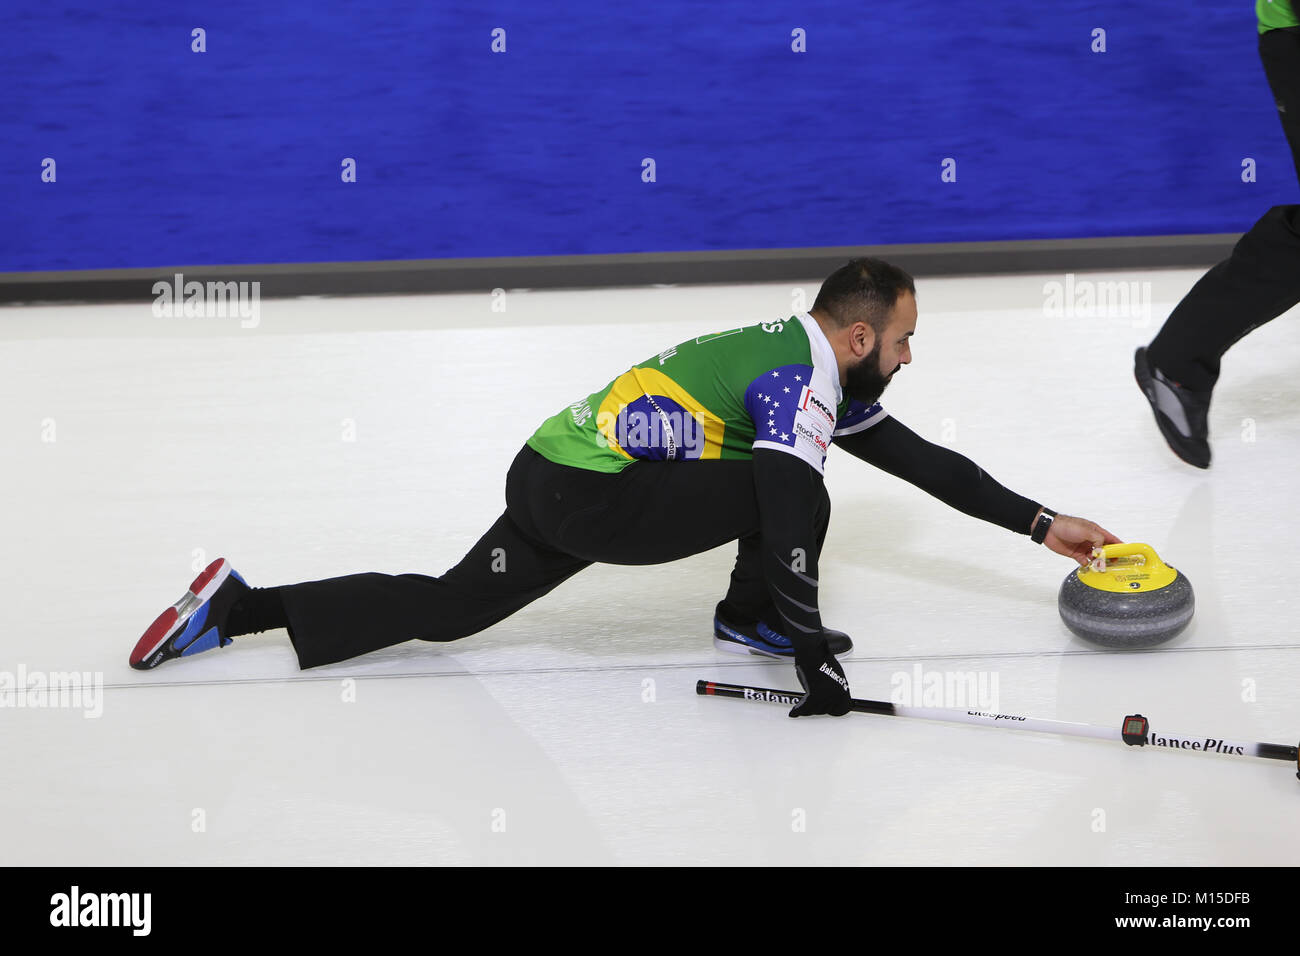 Team Brazil Stock Photos & Team Brazil Stock Images - Alamy